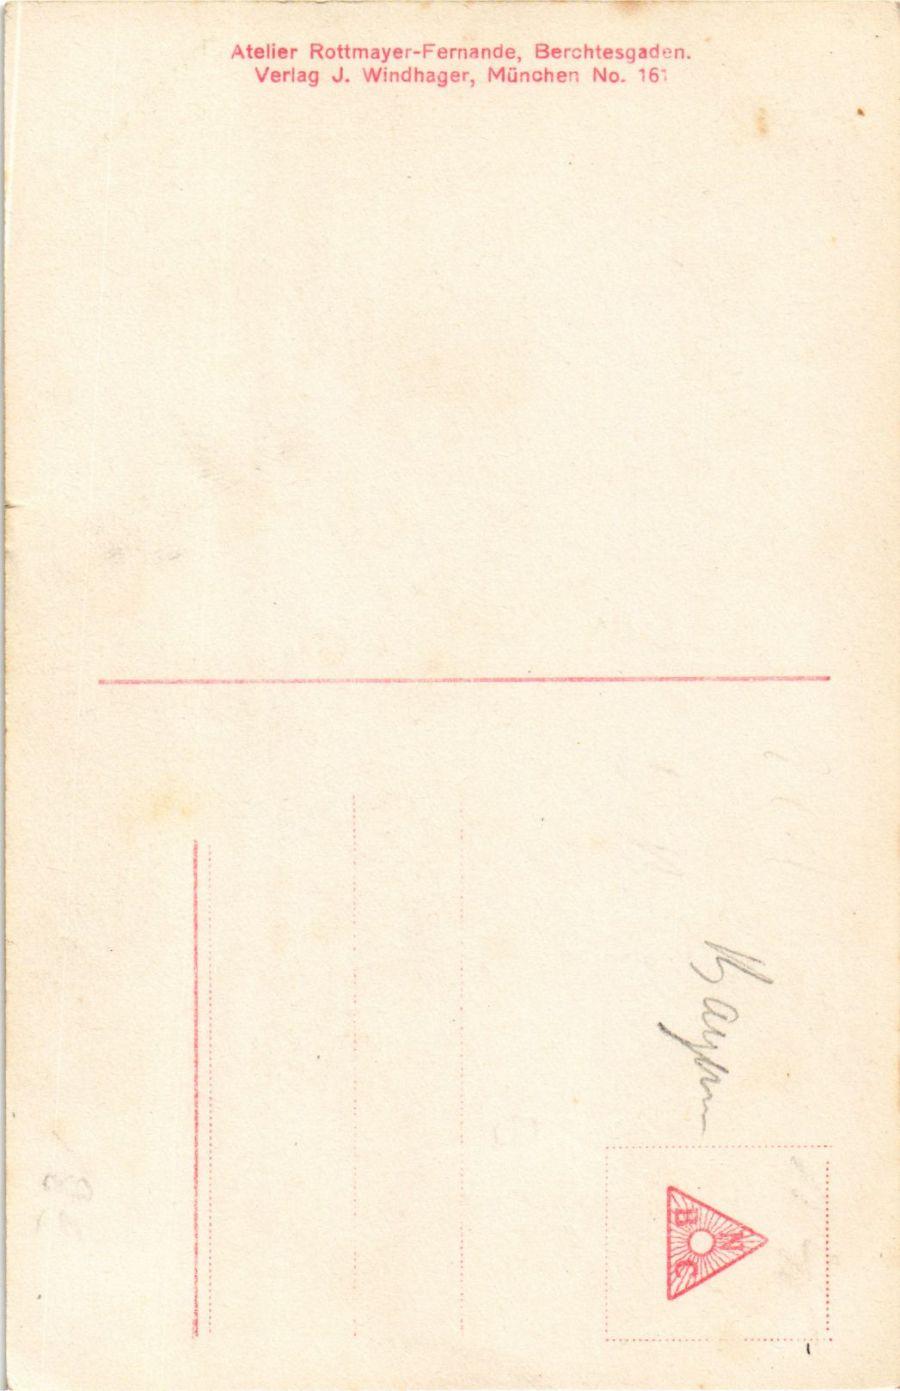 CPA-AK-Prinz-Luitpold-u-Albrecht-v-Bayern-GERMAN-ROYALTY-867366 Indexbild 2